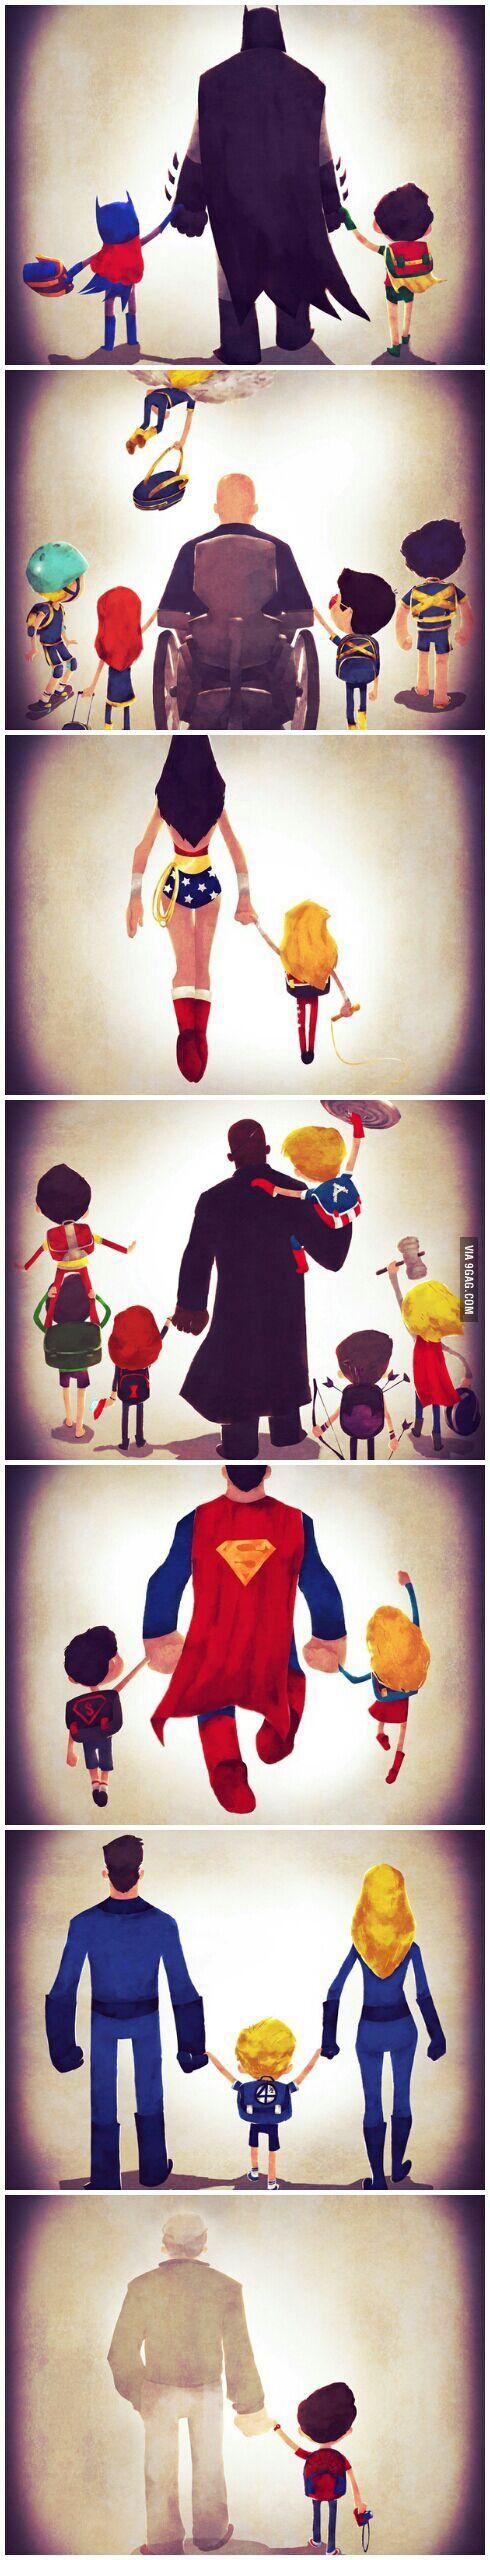 Super hero family time